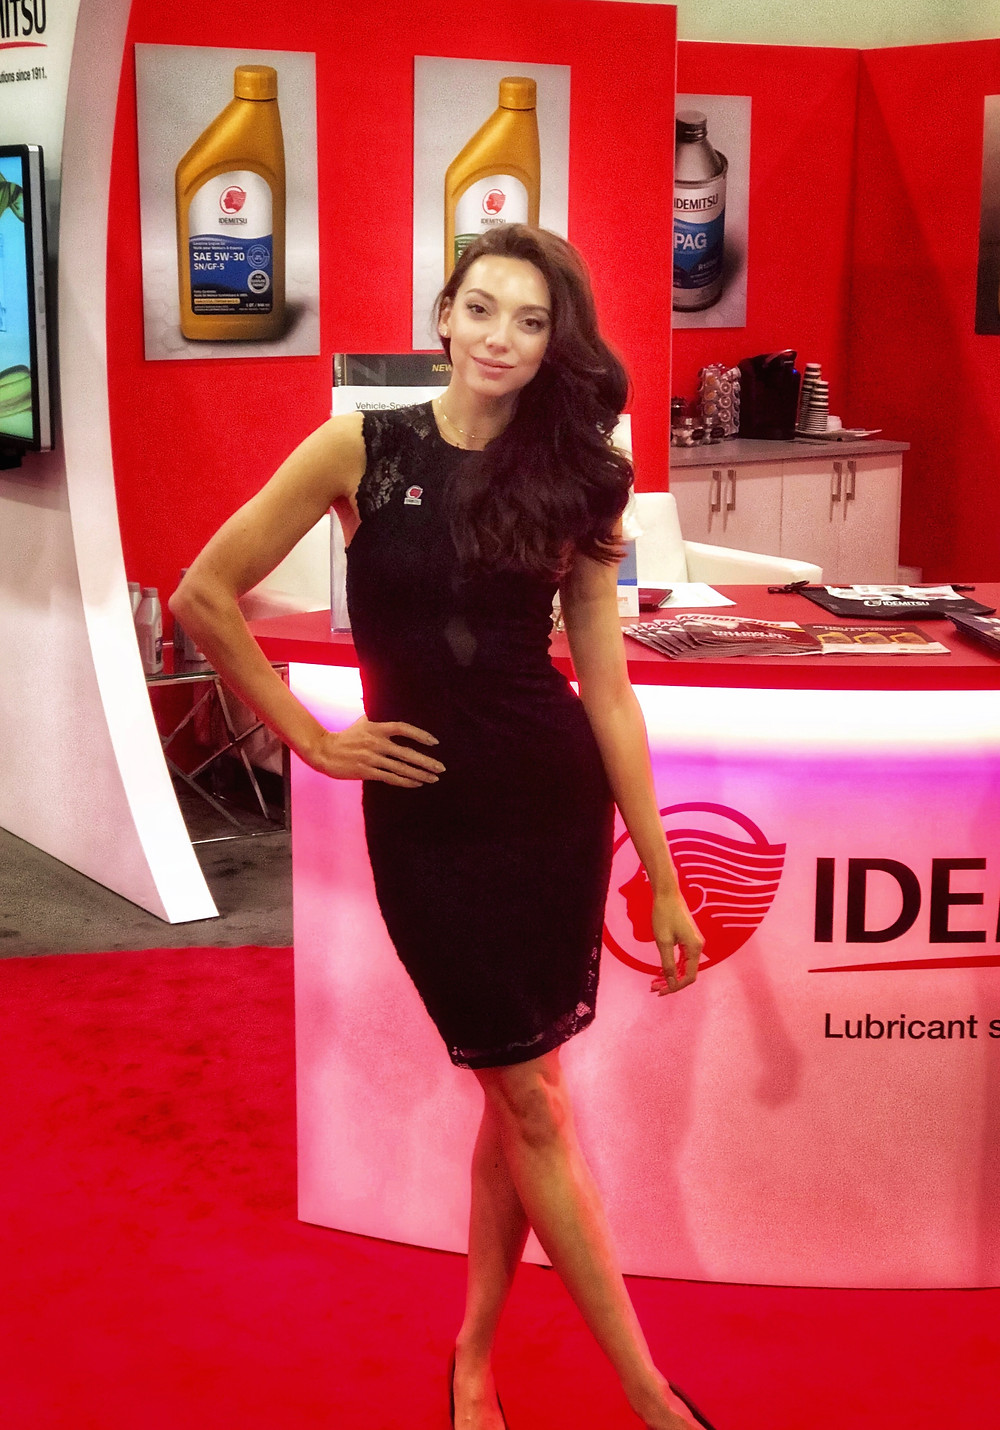 Las Vegas trade show models, Las Vegas convention models, attract agency